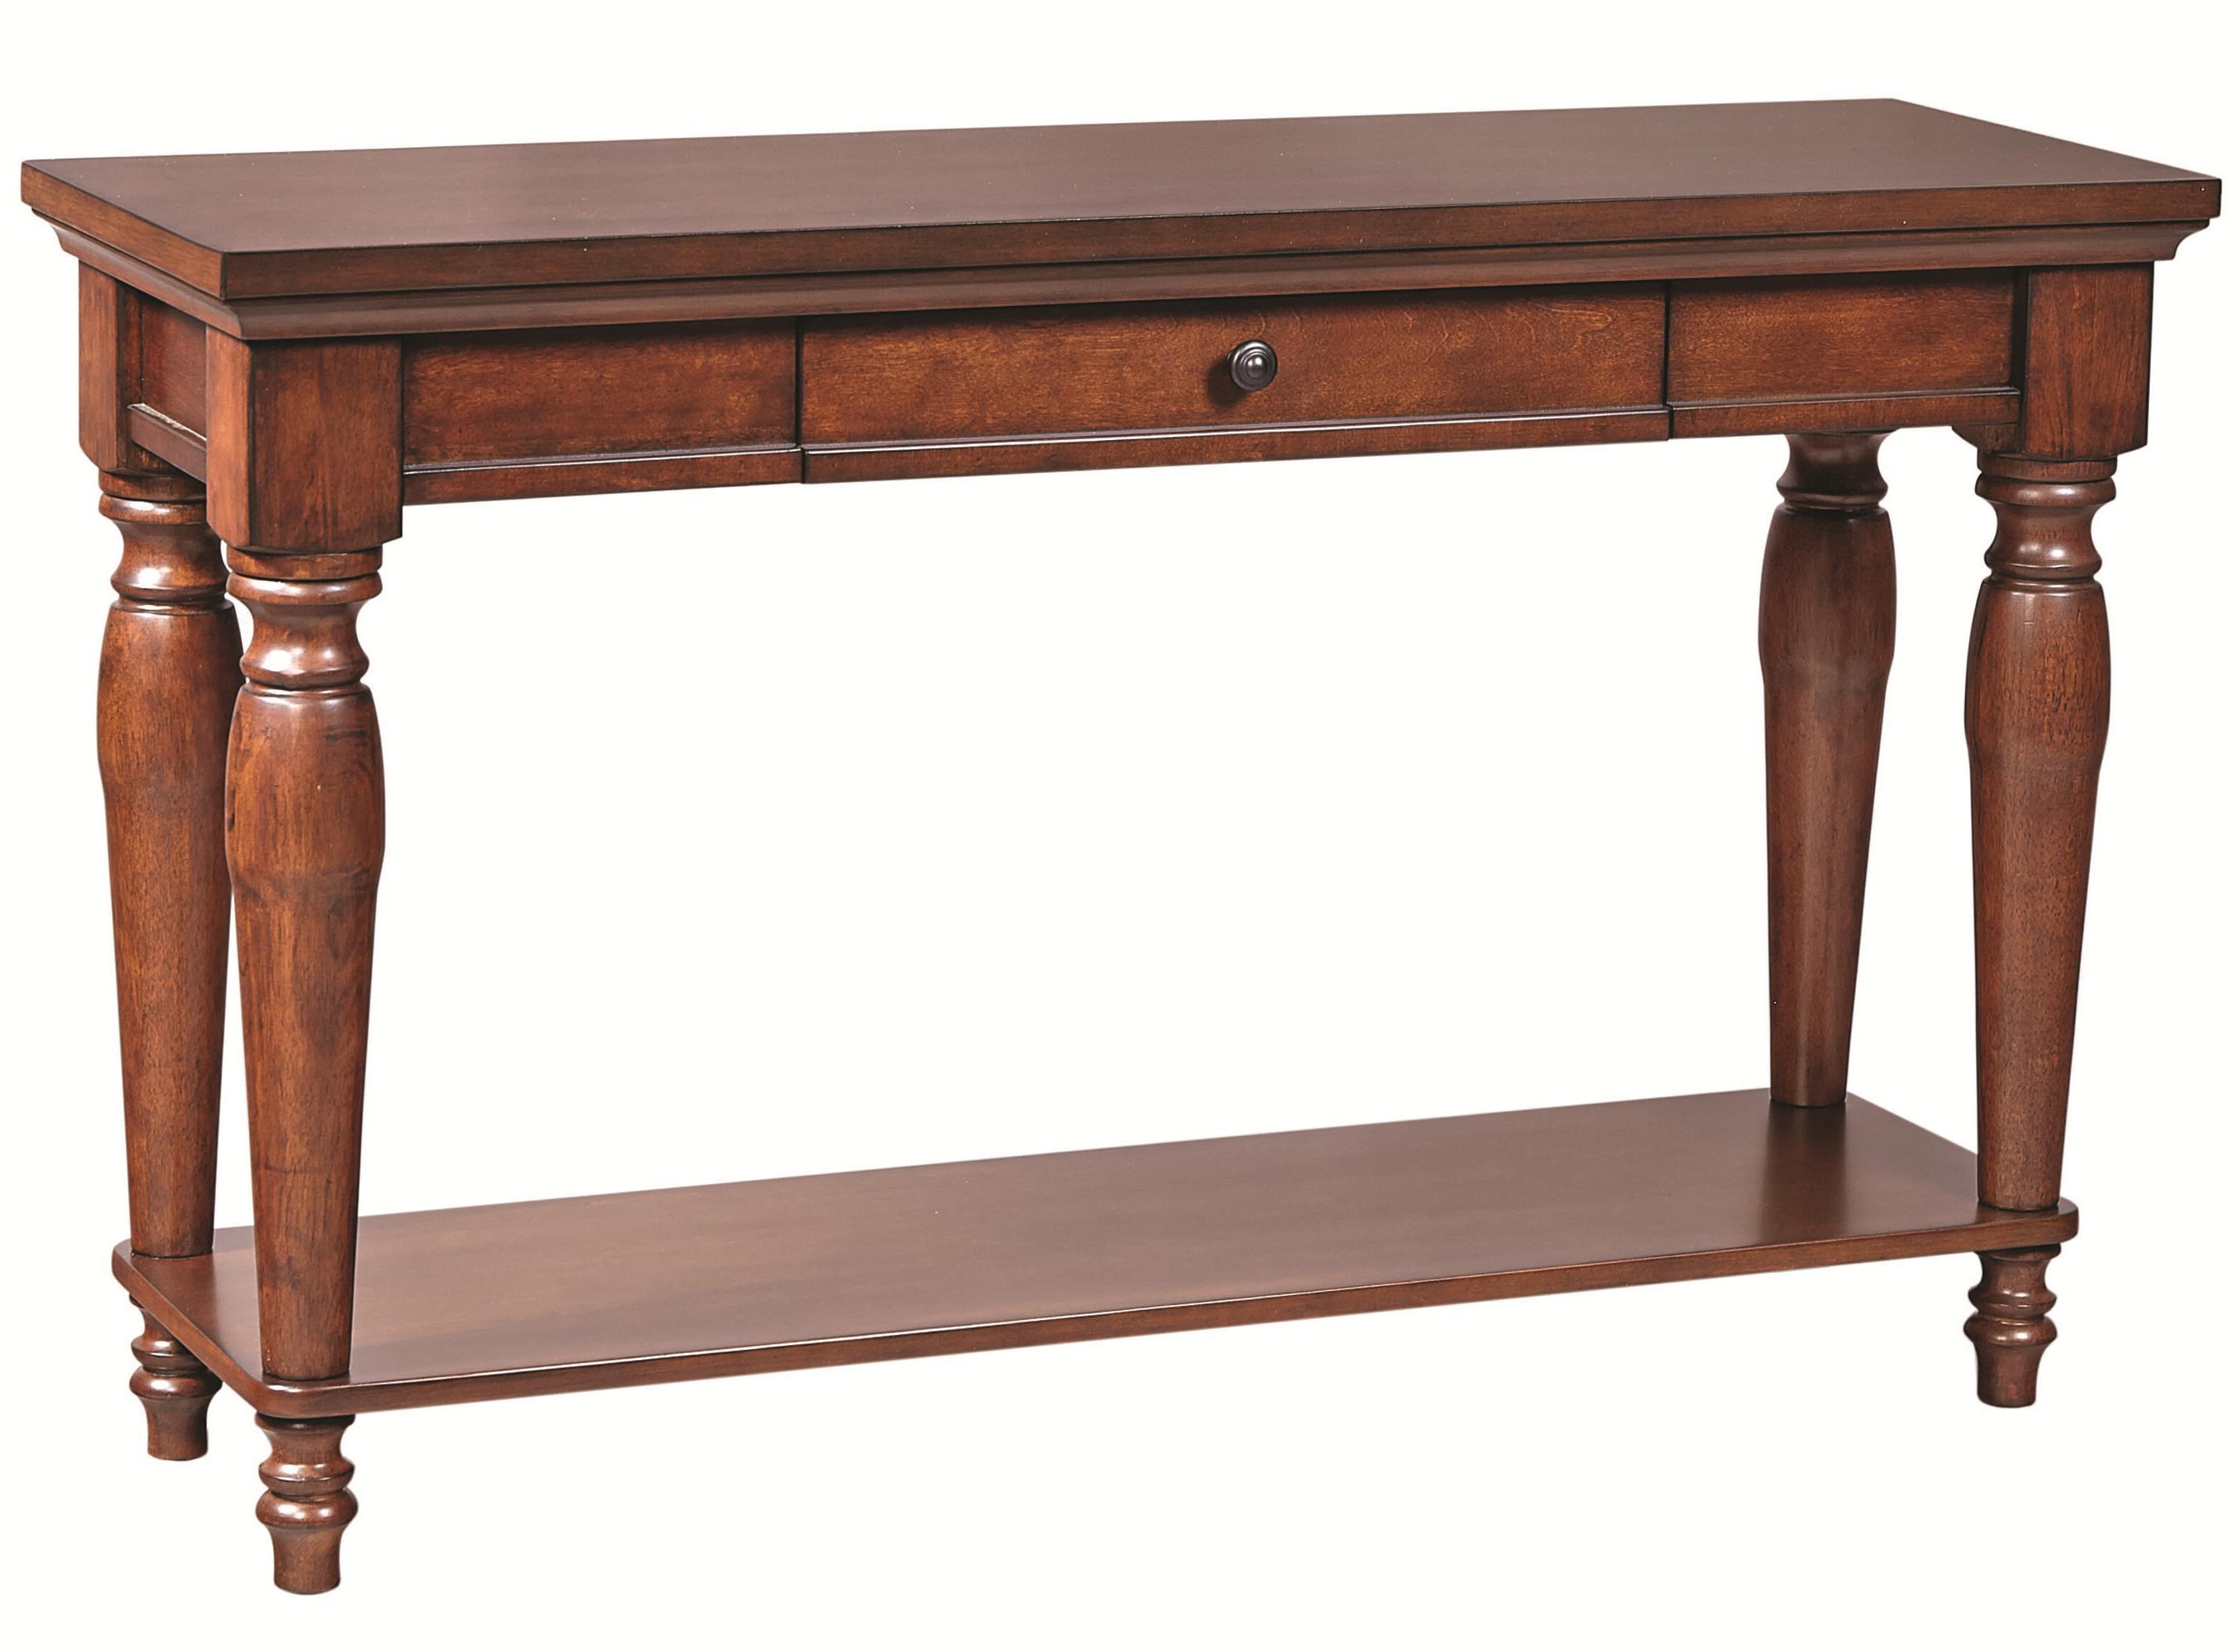 Aspenhome Cambridge Sofa Table - Item Number: ICB-9150-BCH